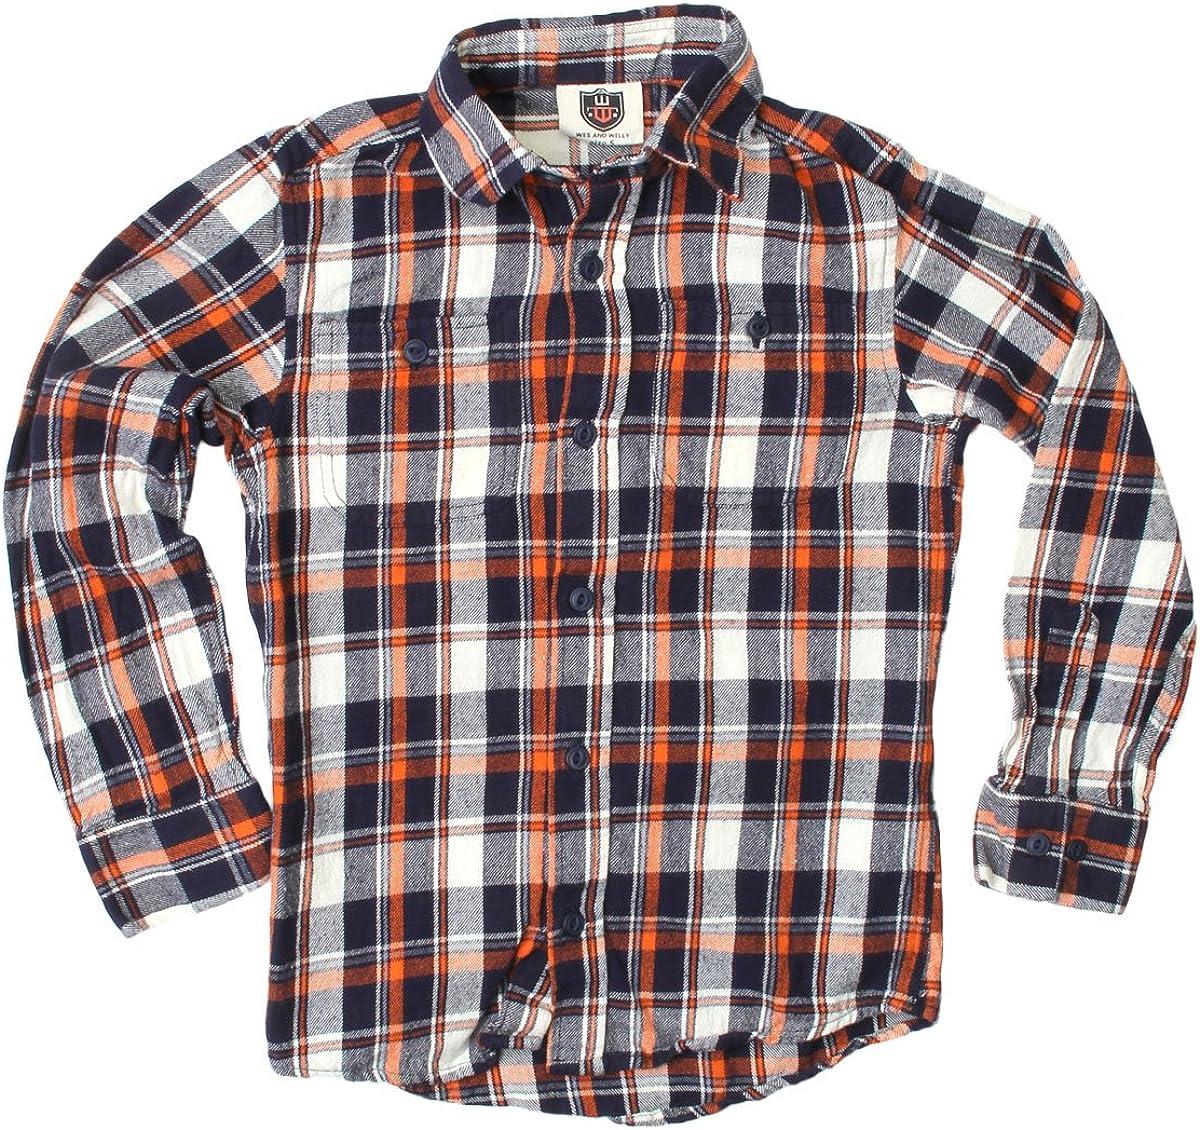 Wes and Willy Orange Crush Plaid Shirt